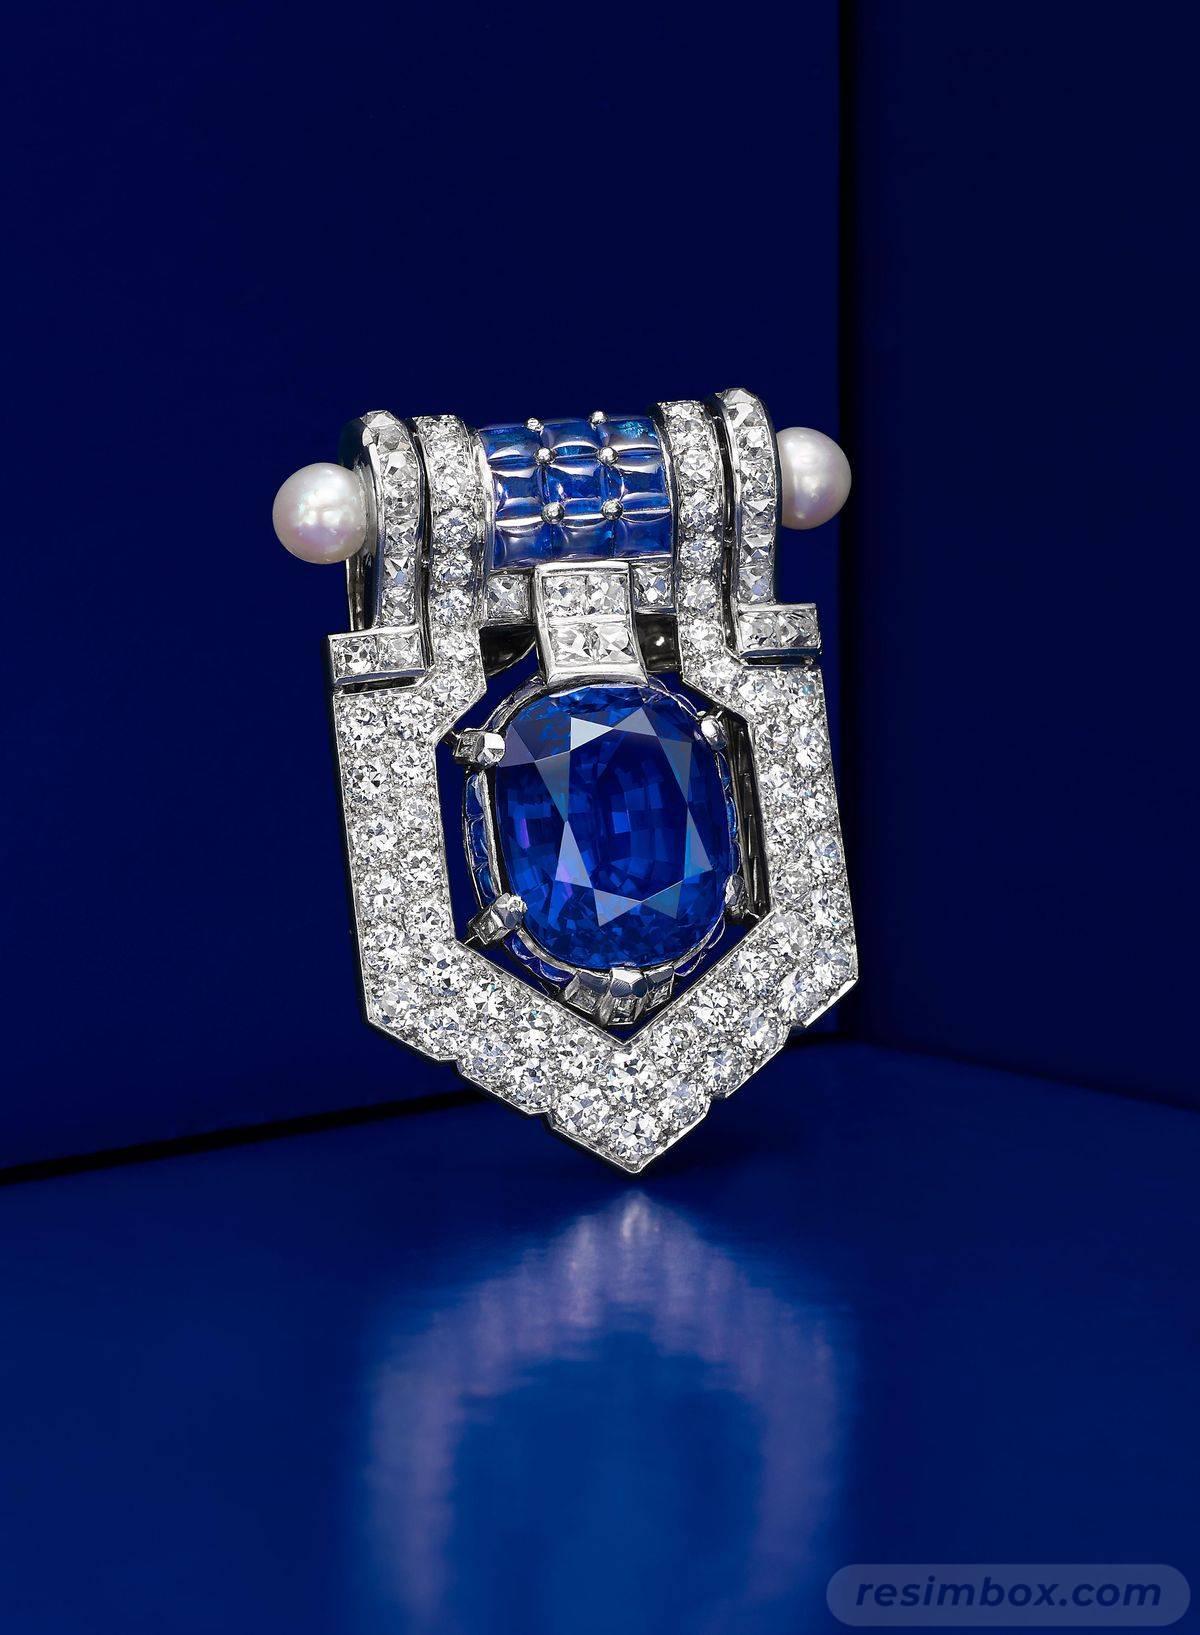 Art deco jewelry-447545281721288502